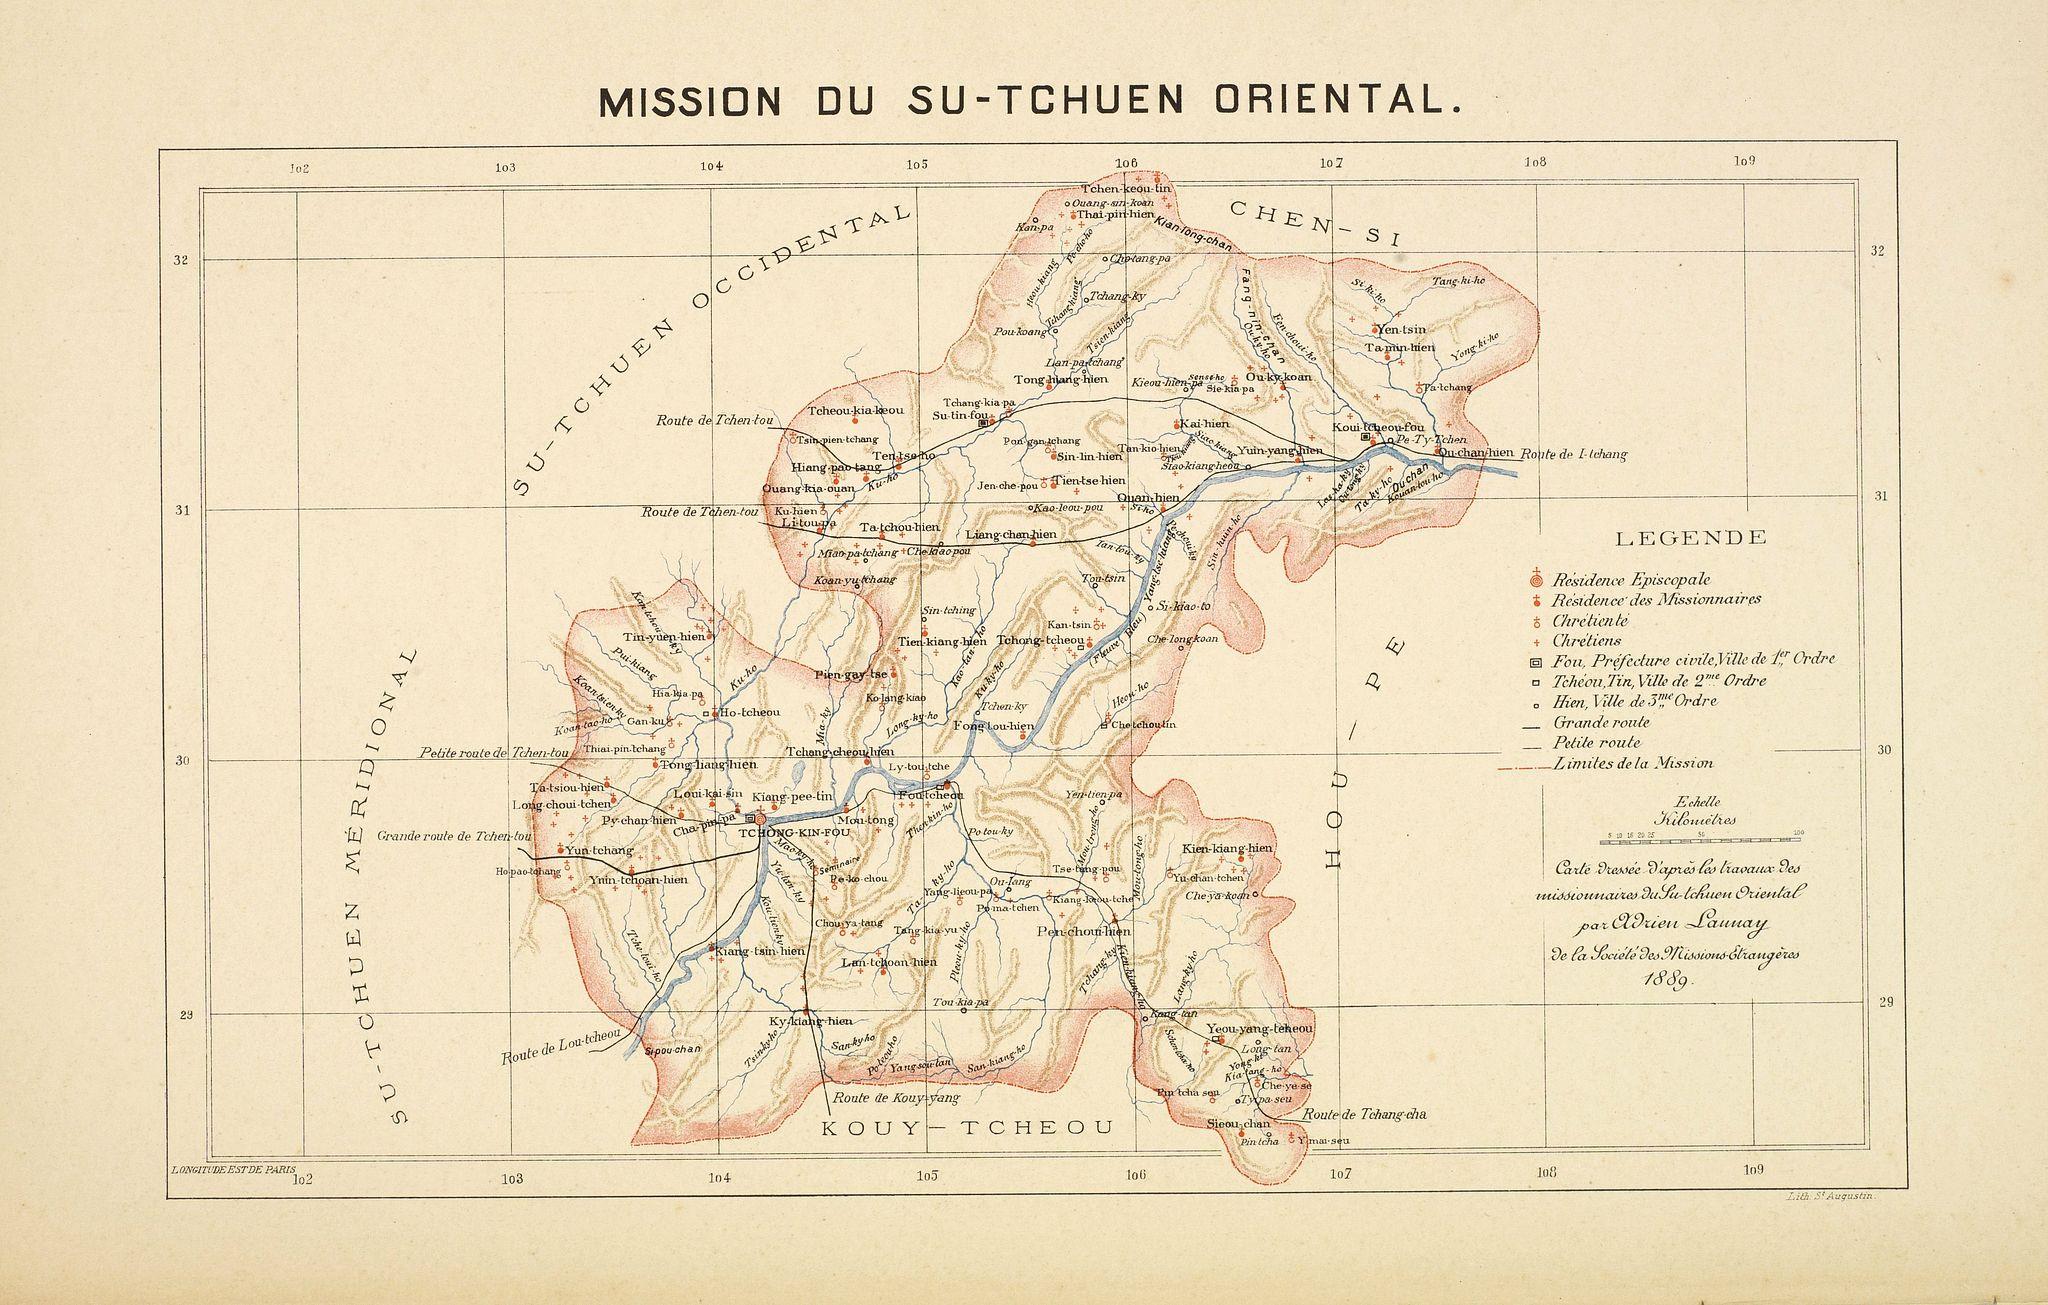 LAUNAY, A. -  Mission du Su-Tchuen Oriental.